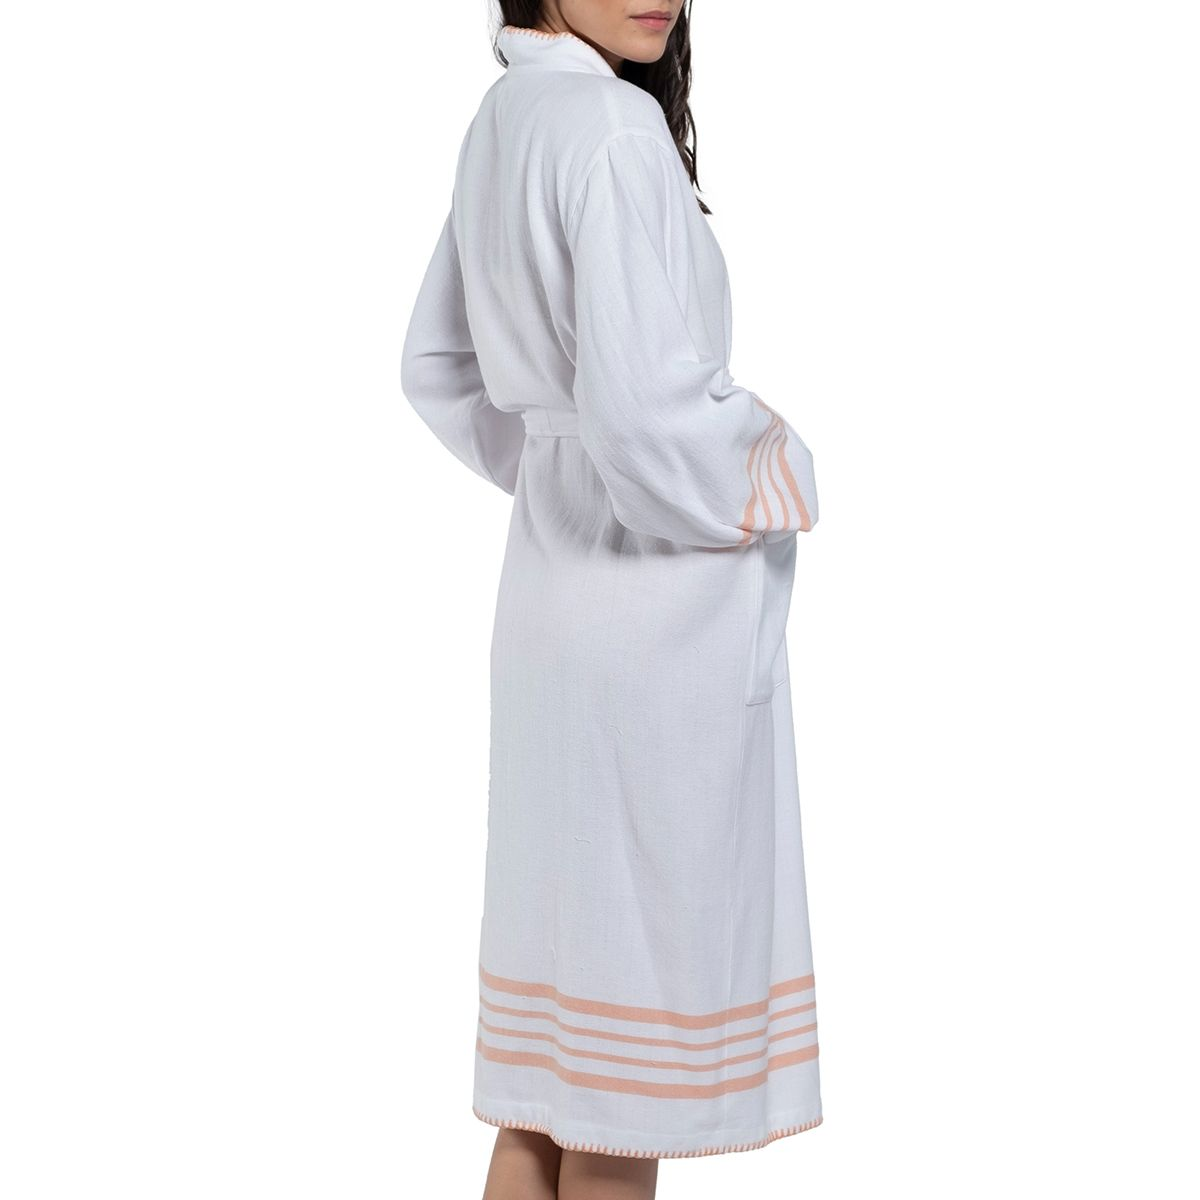 Bathrobe White Sultan - Melon Stripes